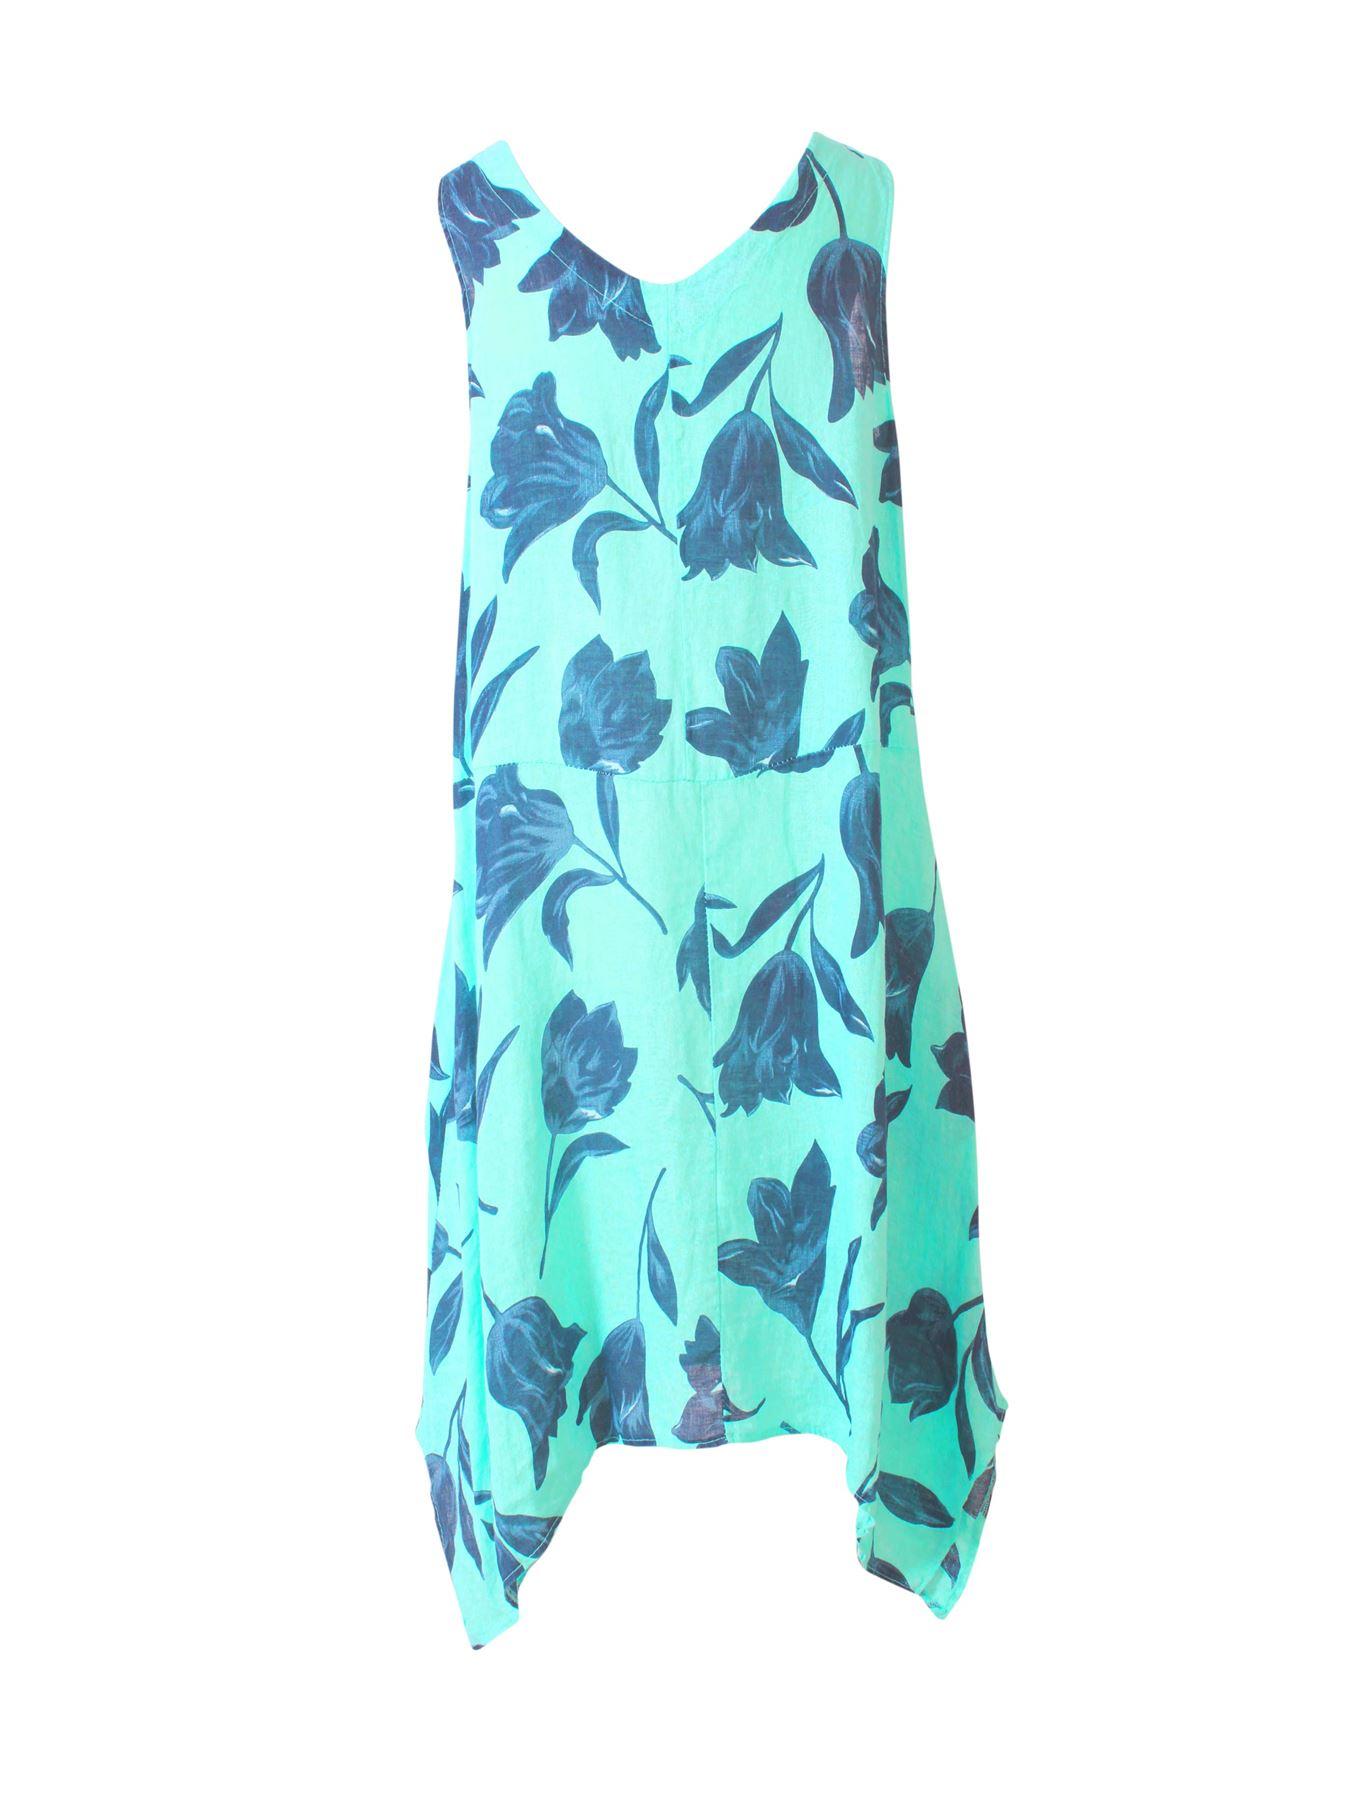 Womens-Tulip-Floral-Print-Italian-Lagenlook-Ladies-Linen-Dress-Two-Button-V-Neck thumbnail 21